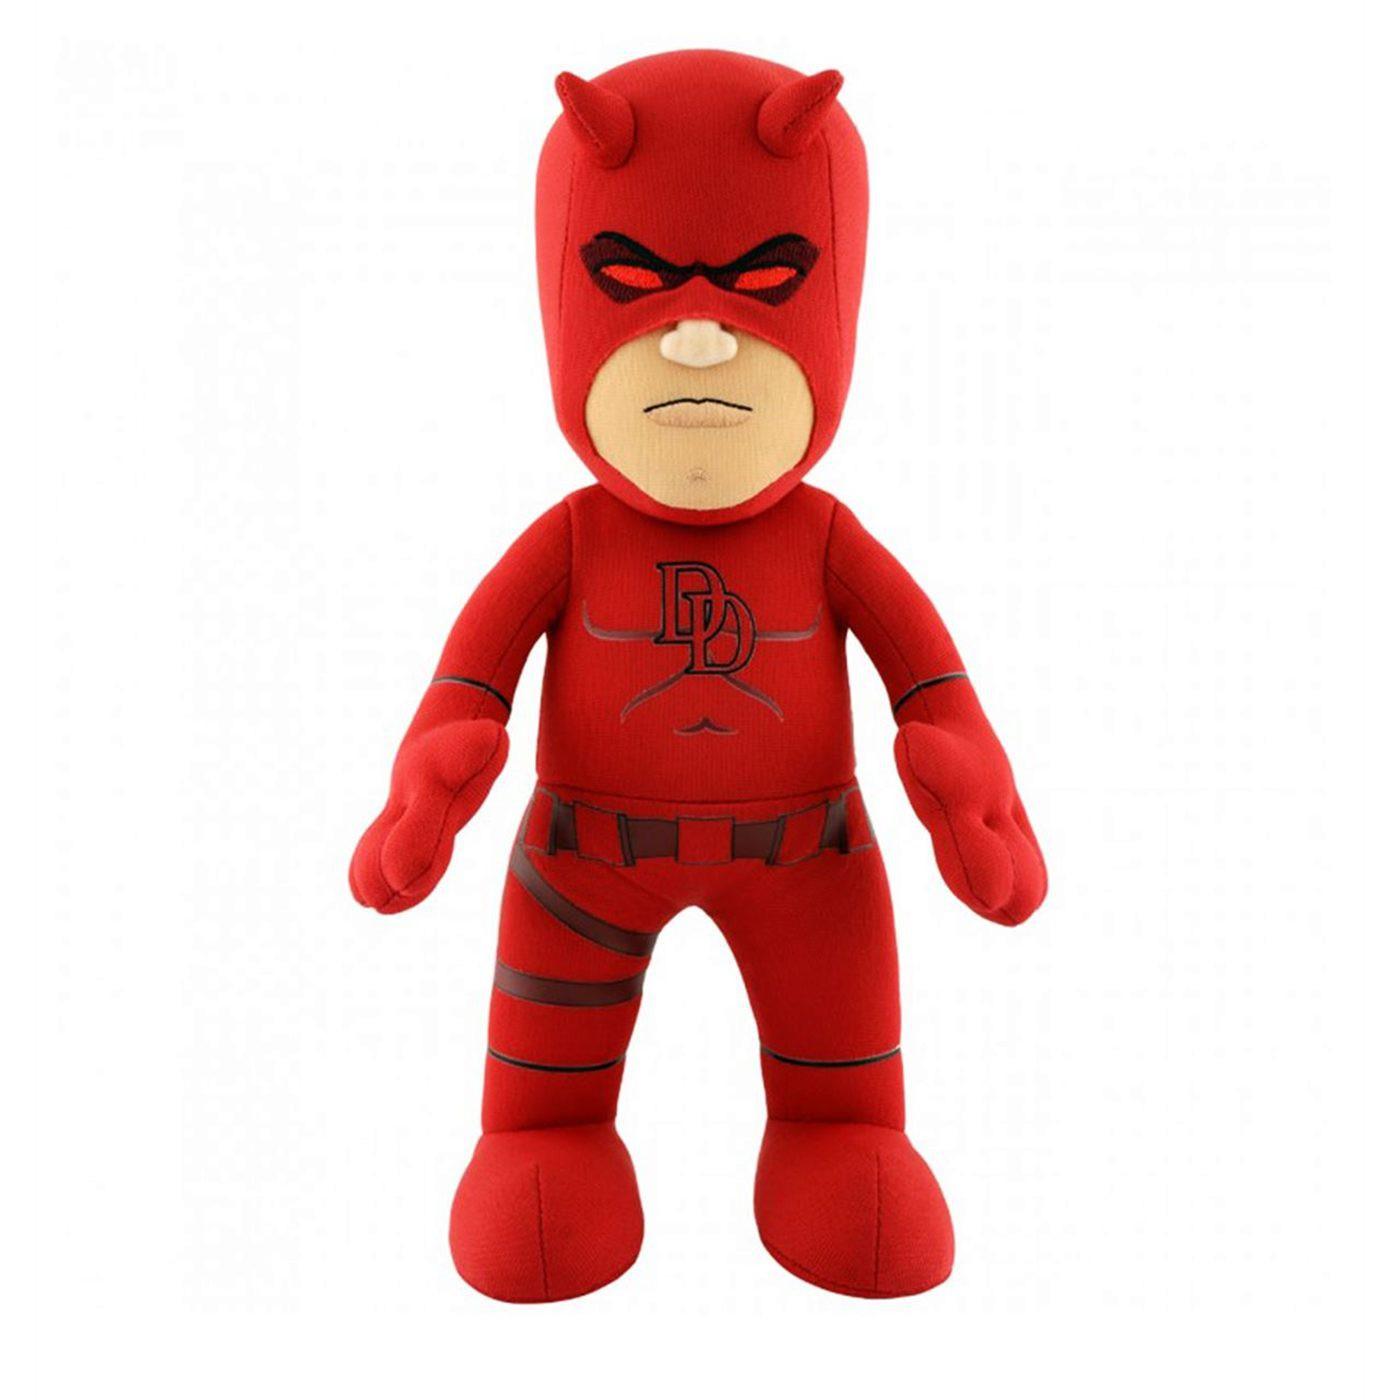 Daredevil Plush Bleacher Creature Figure